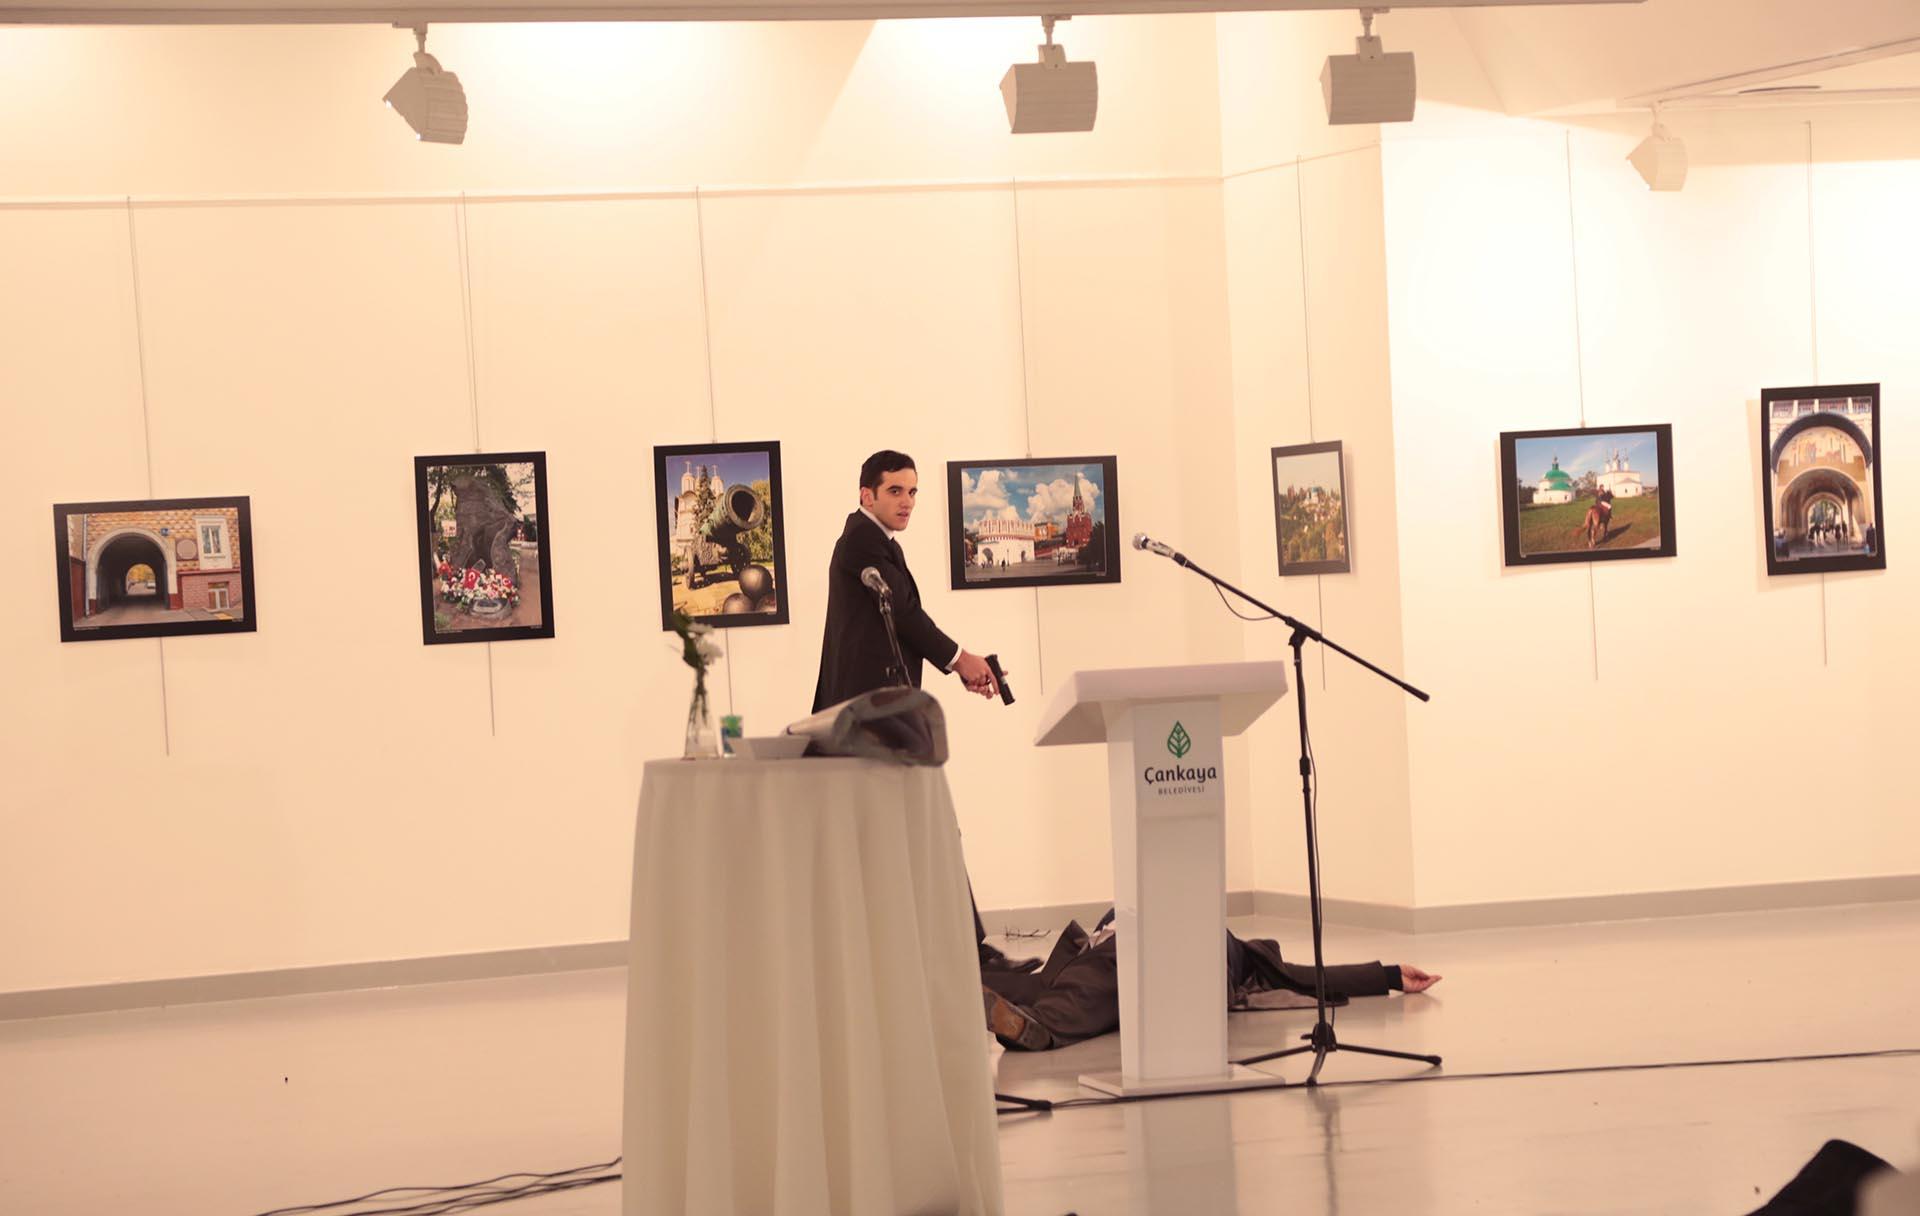 https://s3.amazonaws.com/arc-wordpress-client-uploads/infobae-wp/wp-content/uploads/2016/12/19150858/Galeria-SF-asesinato-embajador-ruso-turquia-Karlov-13.jpg